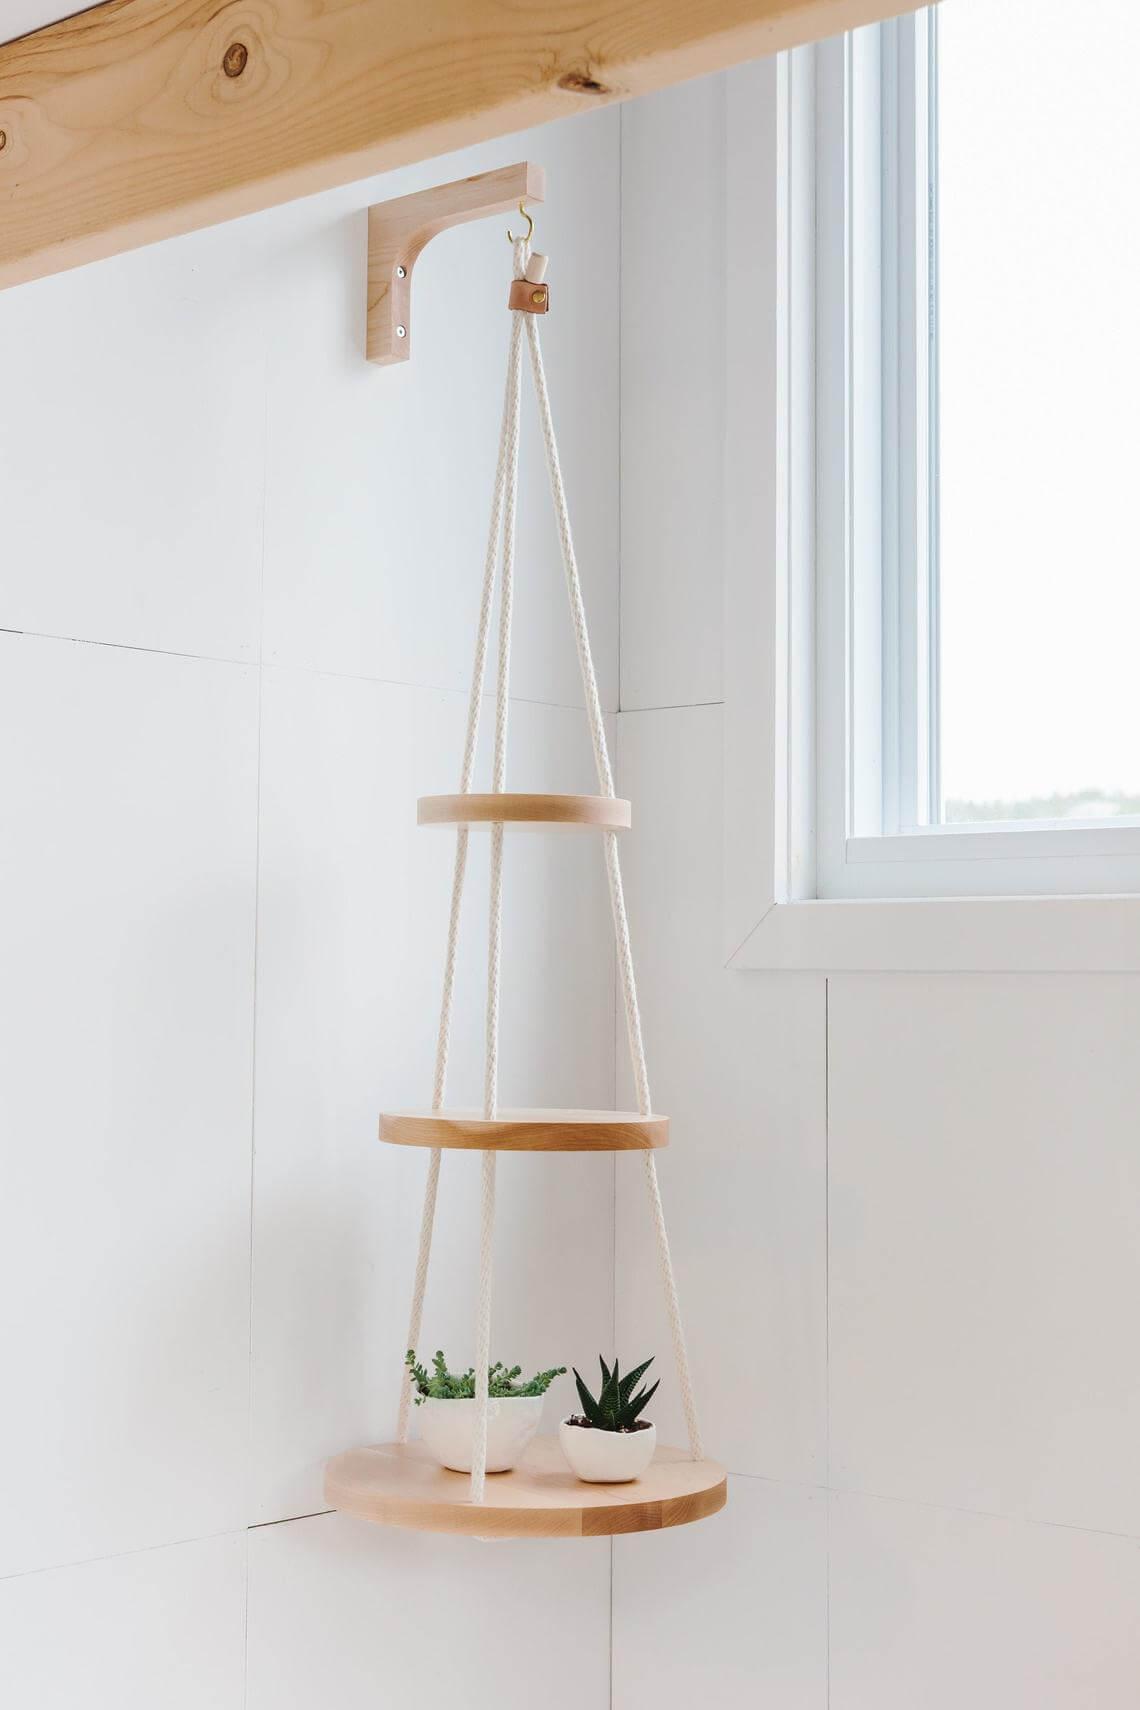 Hanging Modern Contemporary Tiered Bathroom Shelf